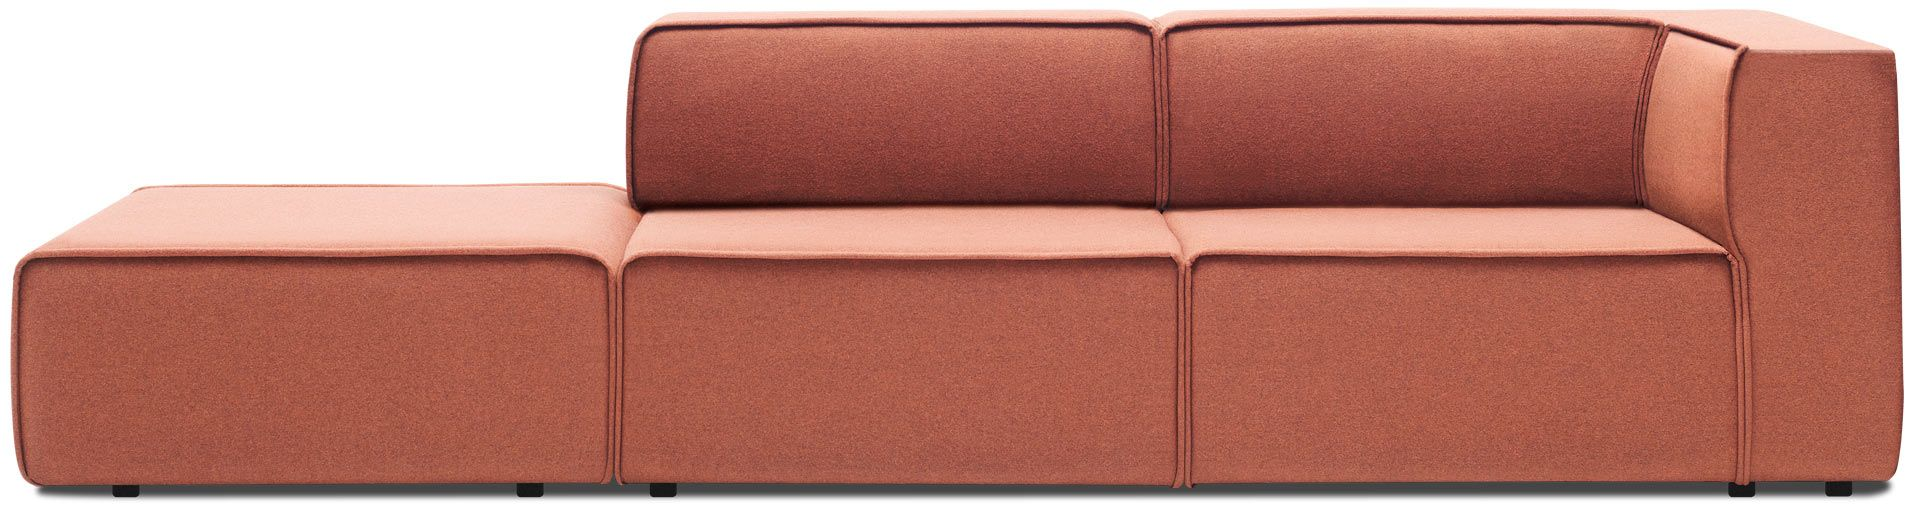 design sofa beds australia cotton pet throw carmo 4300 new furniture designs boconcept modern sydney